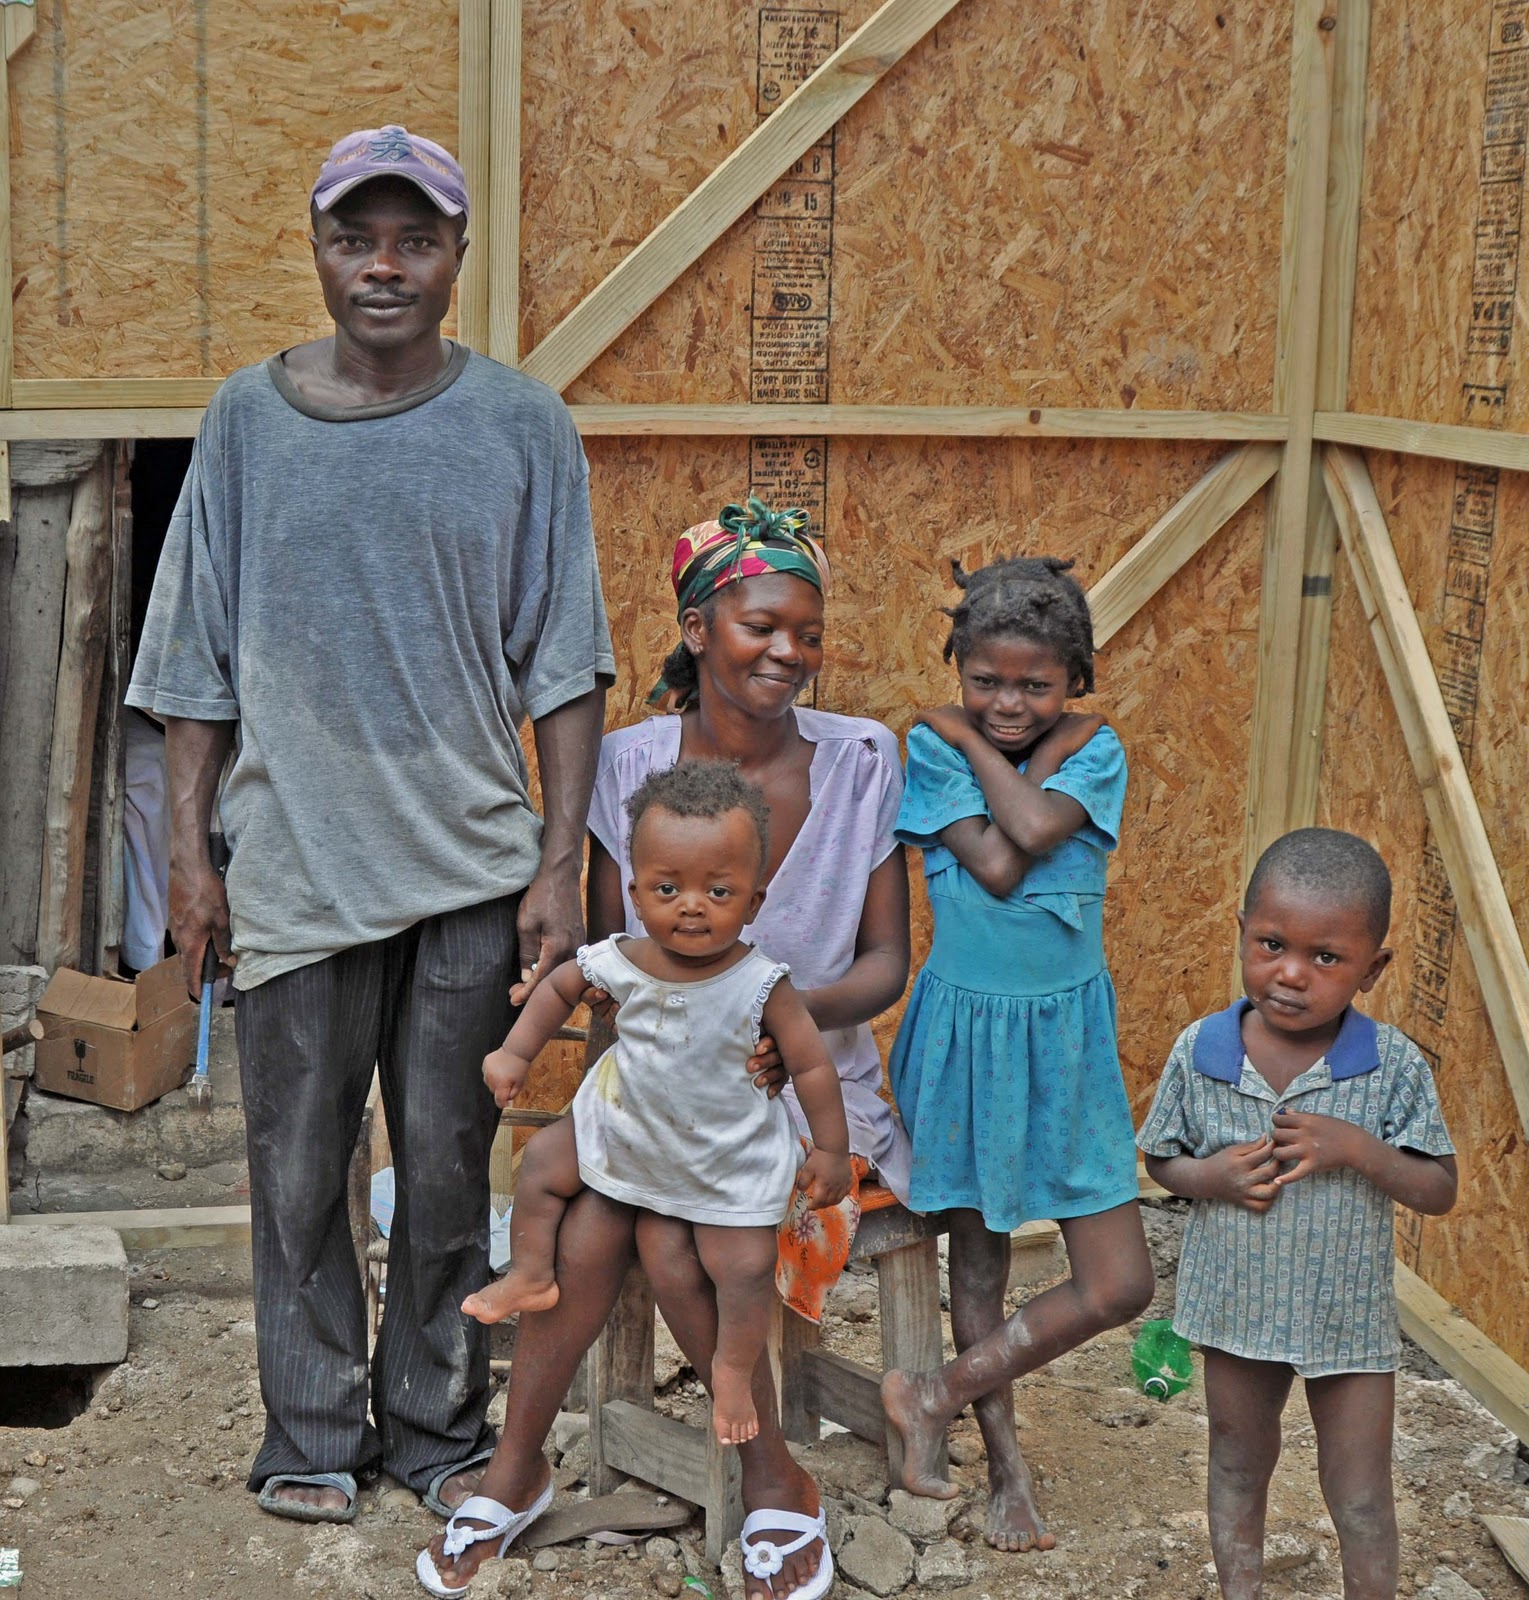 http://4.bp.blogspot.com/_QOJxRZwku_I/TLtl6Ad7JPI/AAAAAAAAAvI/XLfCVUfeaAk/s1600/Family+Espiril.jpg